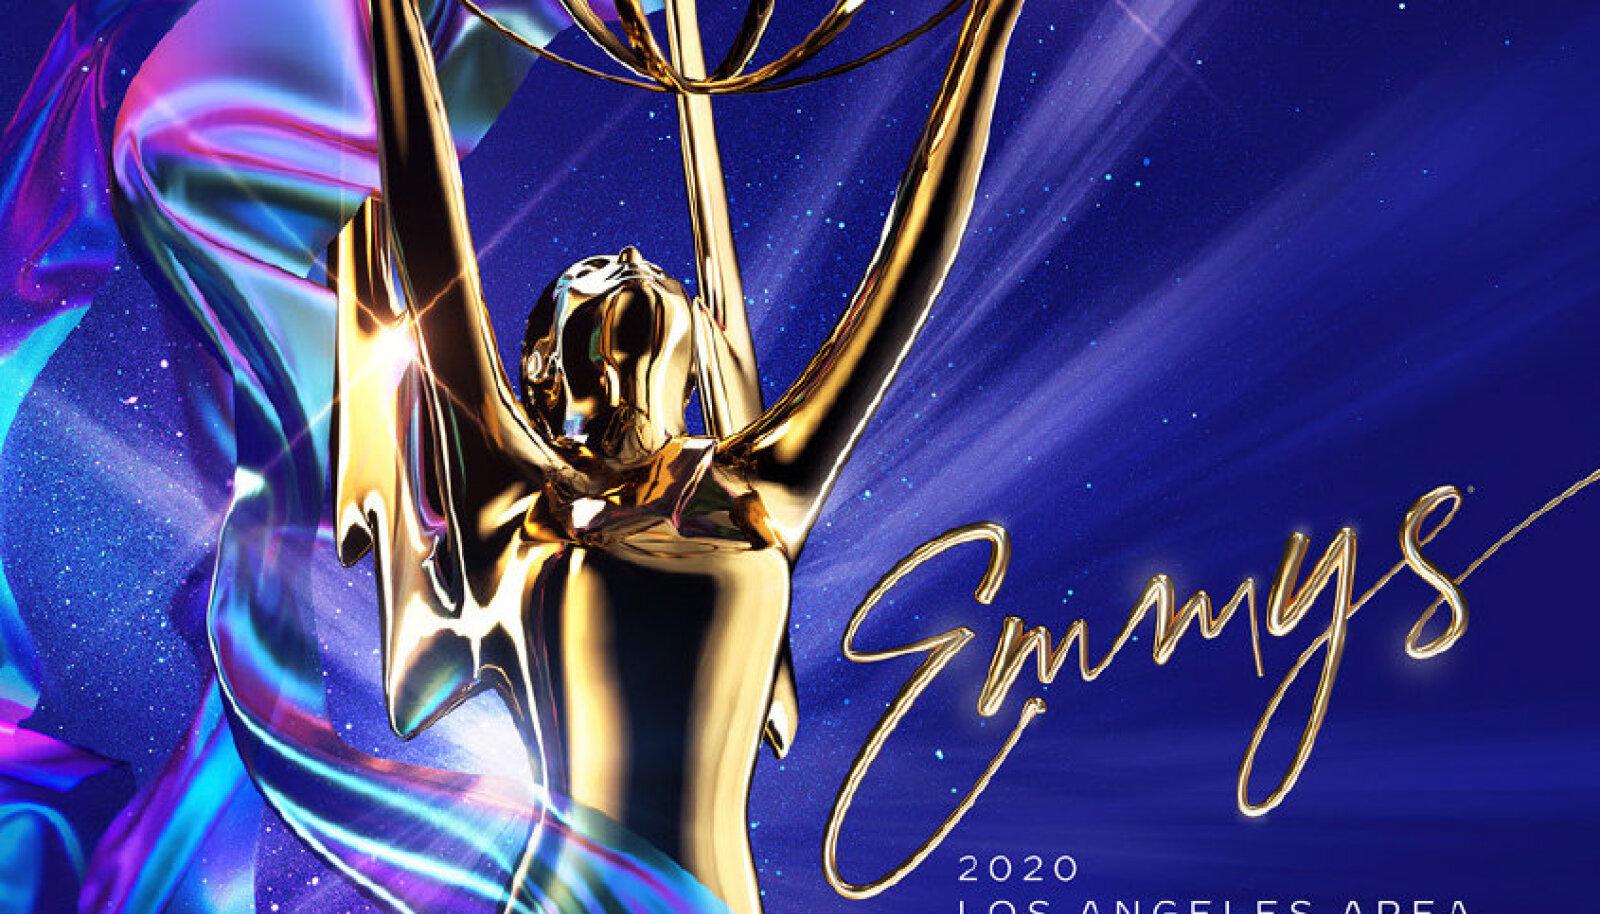 Emmy auhind 2020